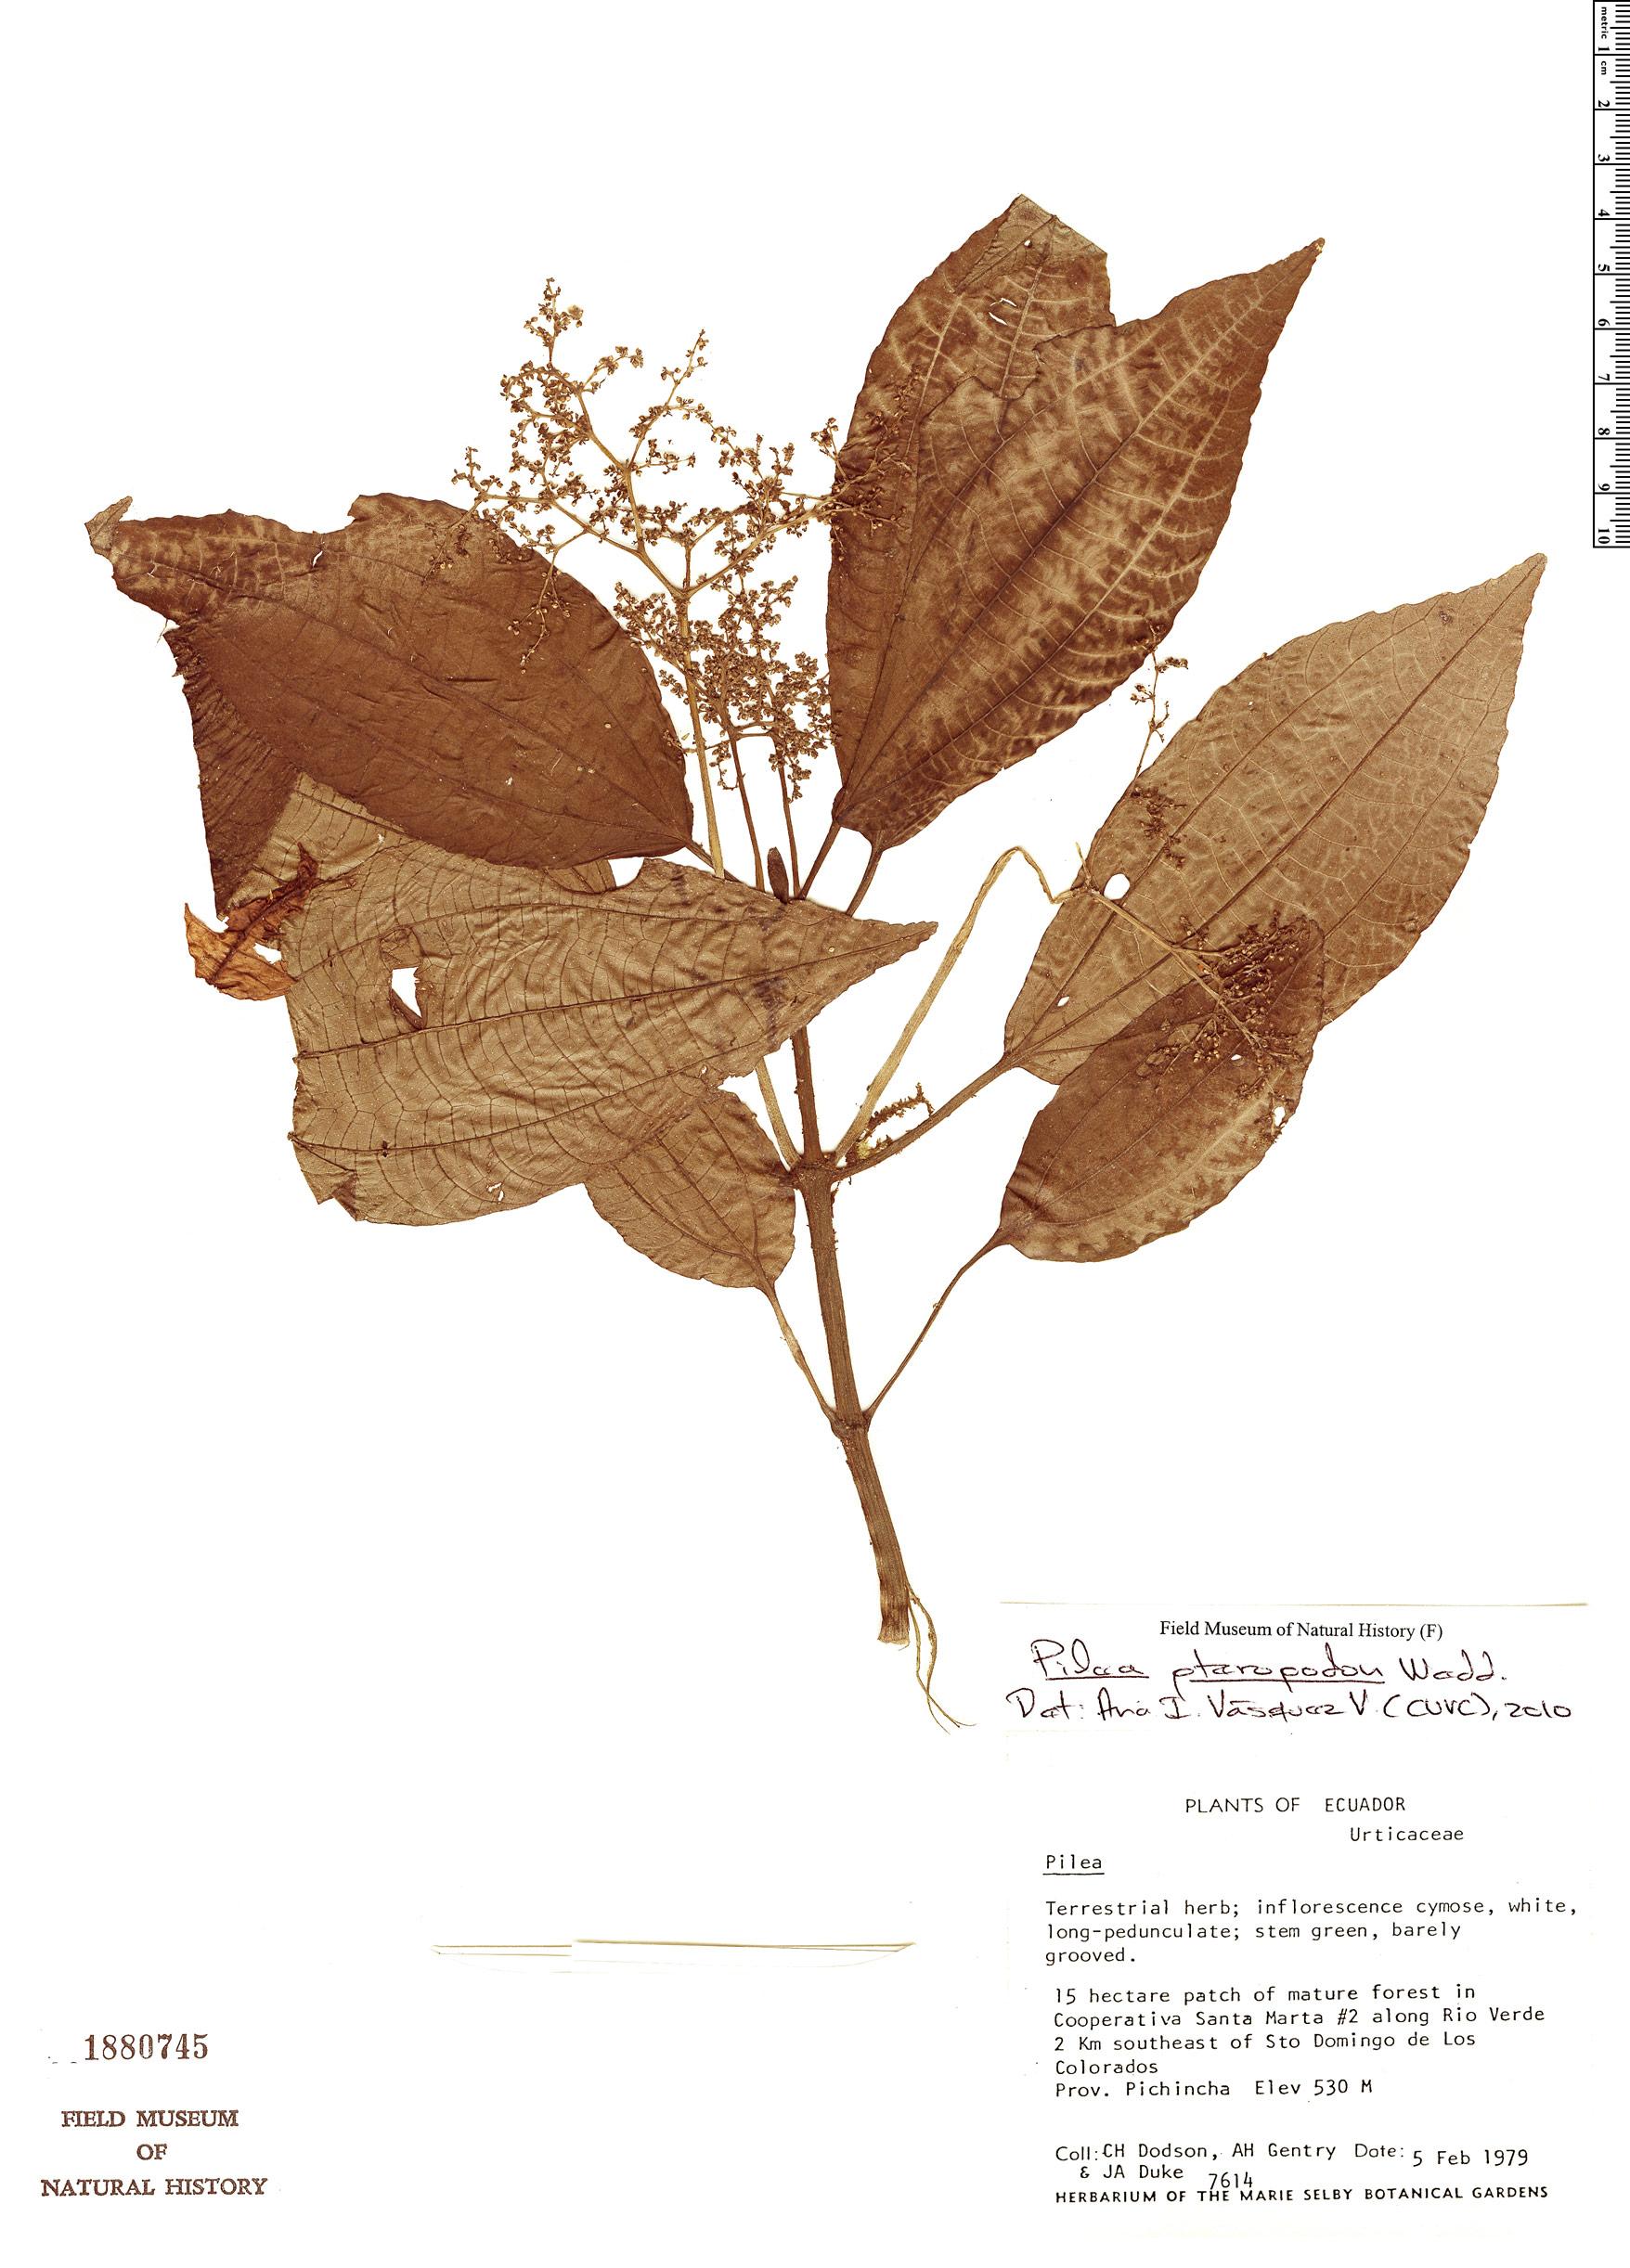 Specimen: Pilea pteropodon